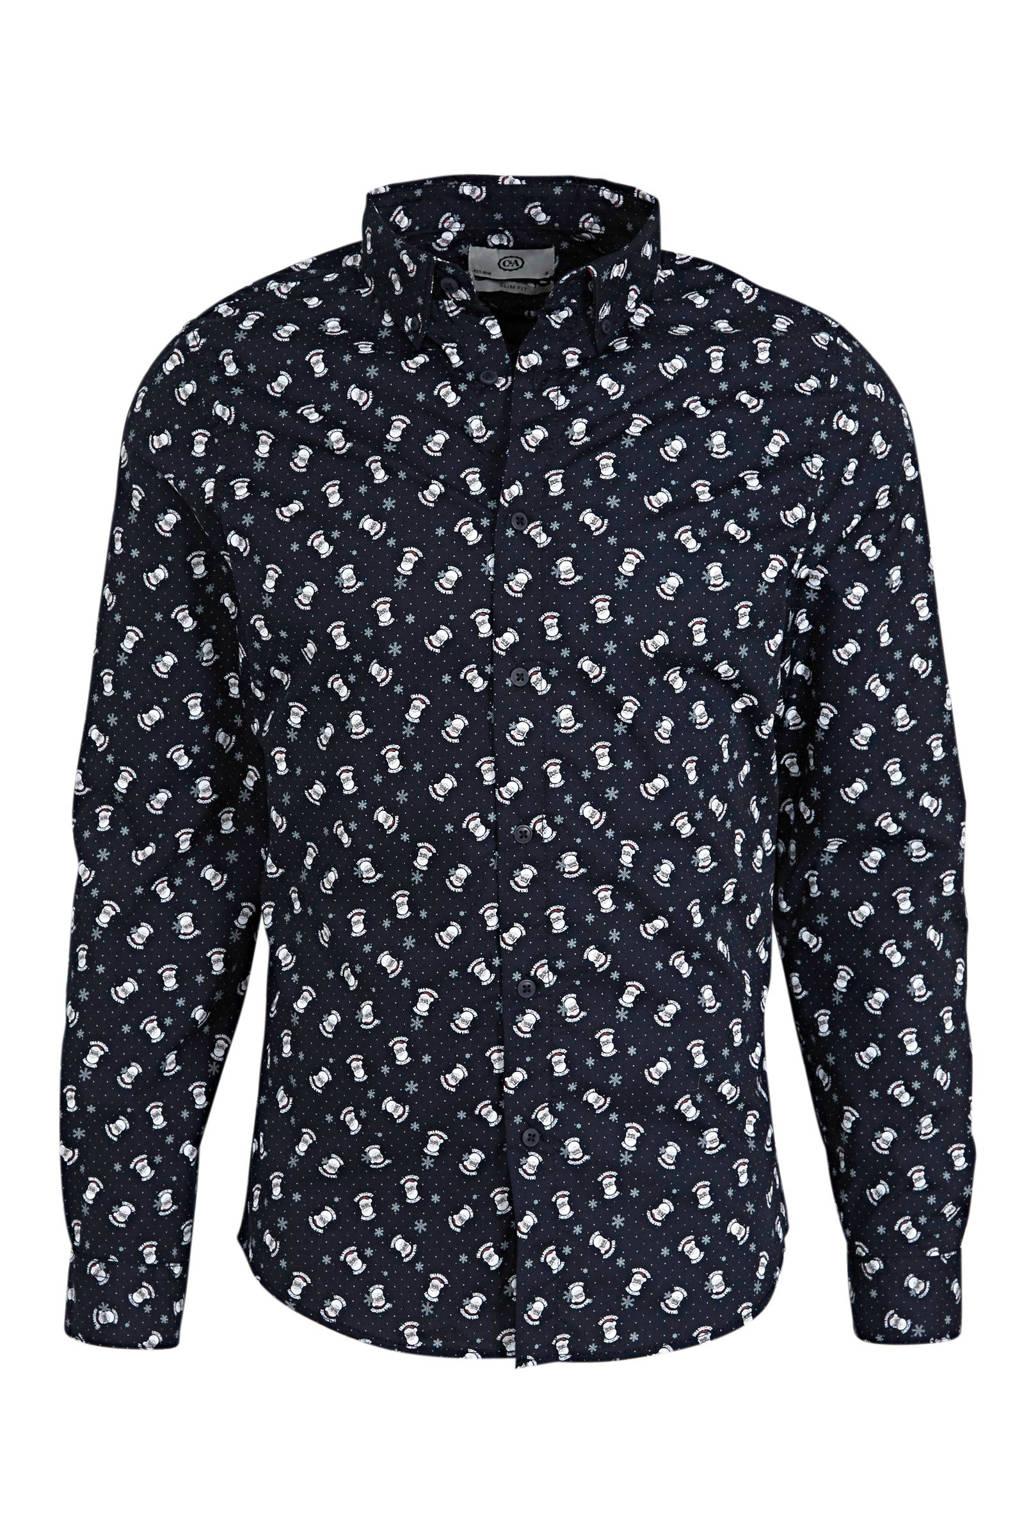 C&A Angelo Litrico slim fit overhemd met kerst print donkerblauw, Donkerblauw